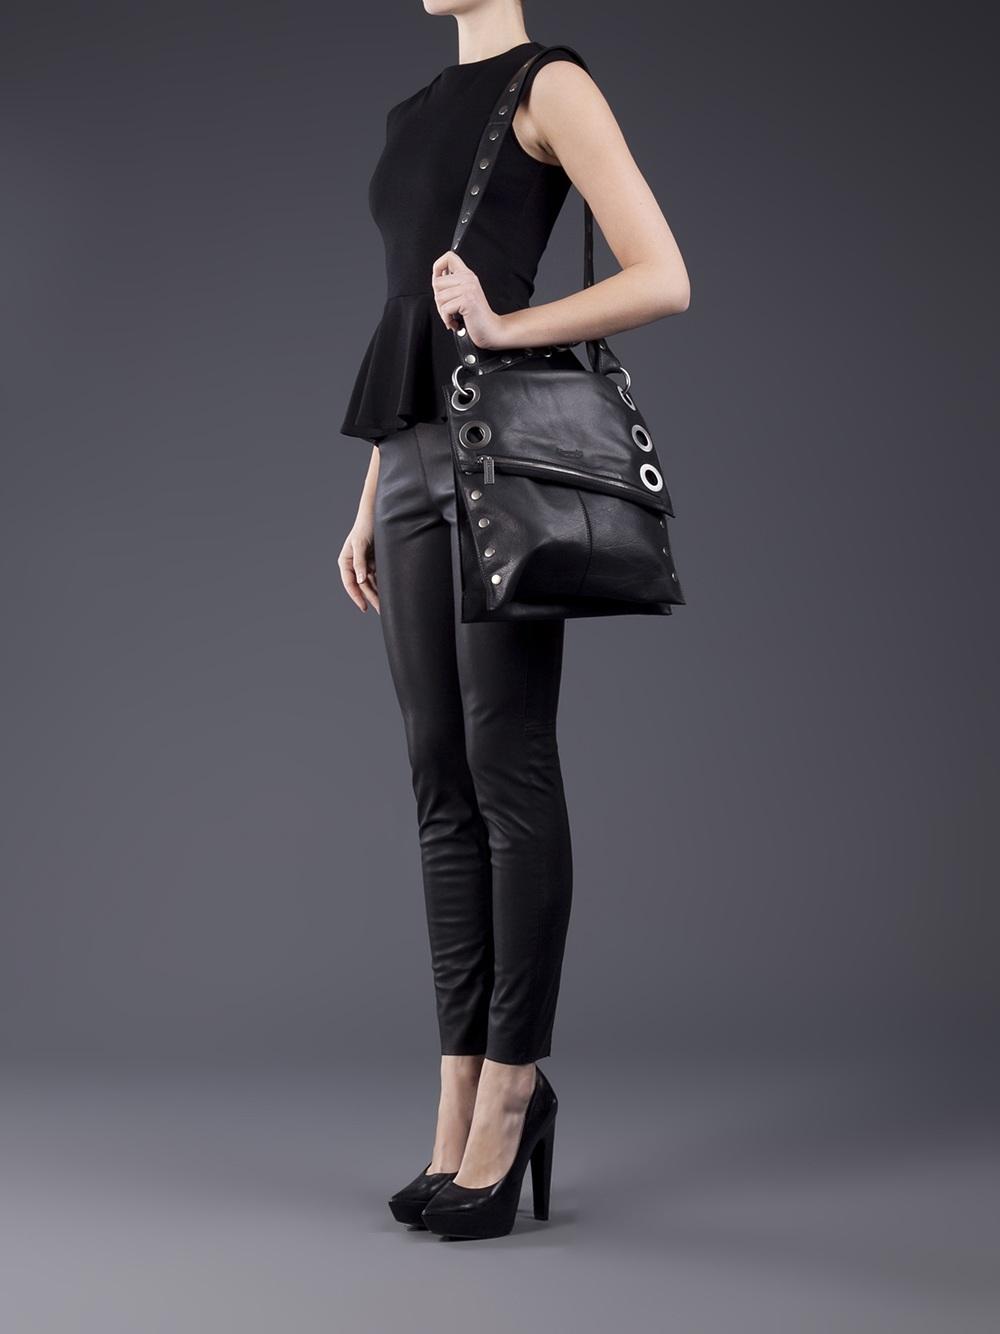 8db14e0d2 Hammitt Fold-Over Leather Cross-Body Bag in Black - Lyst